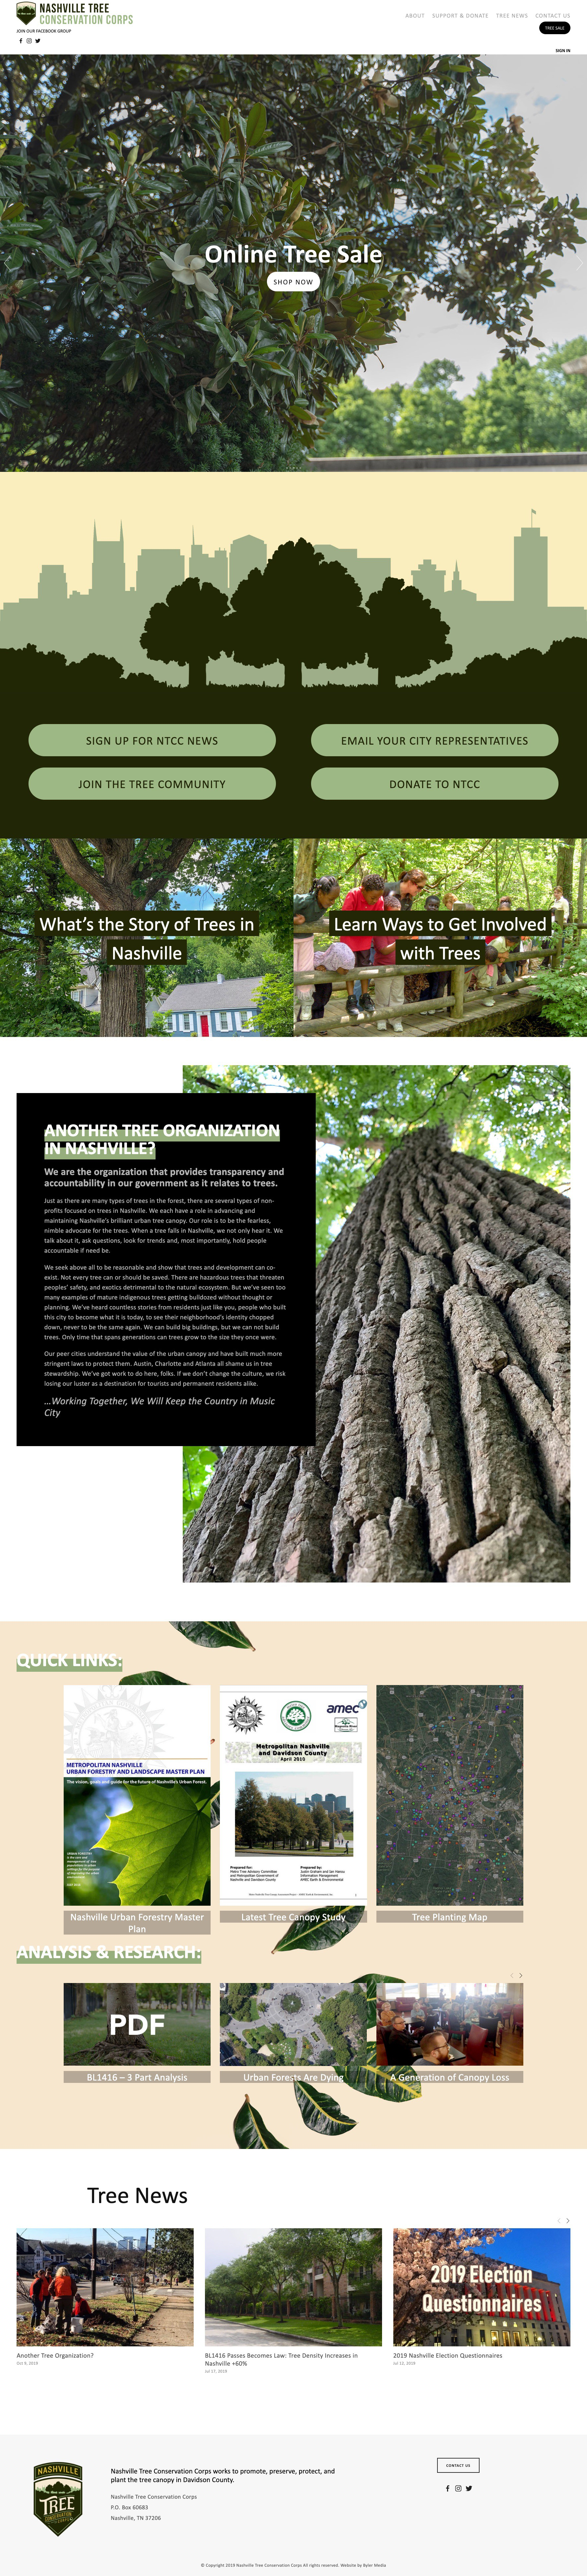 Nashville Tree Conservation Corps